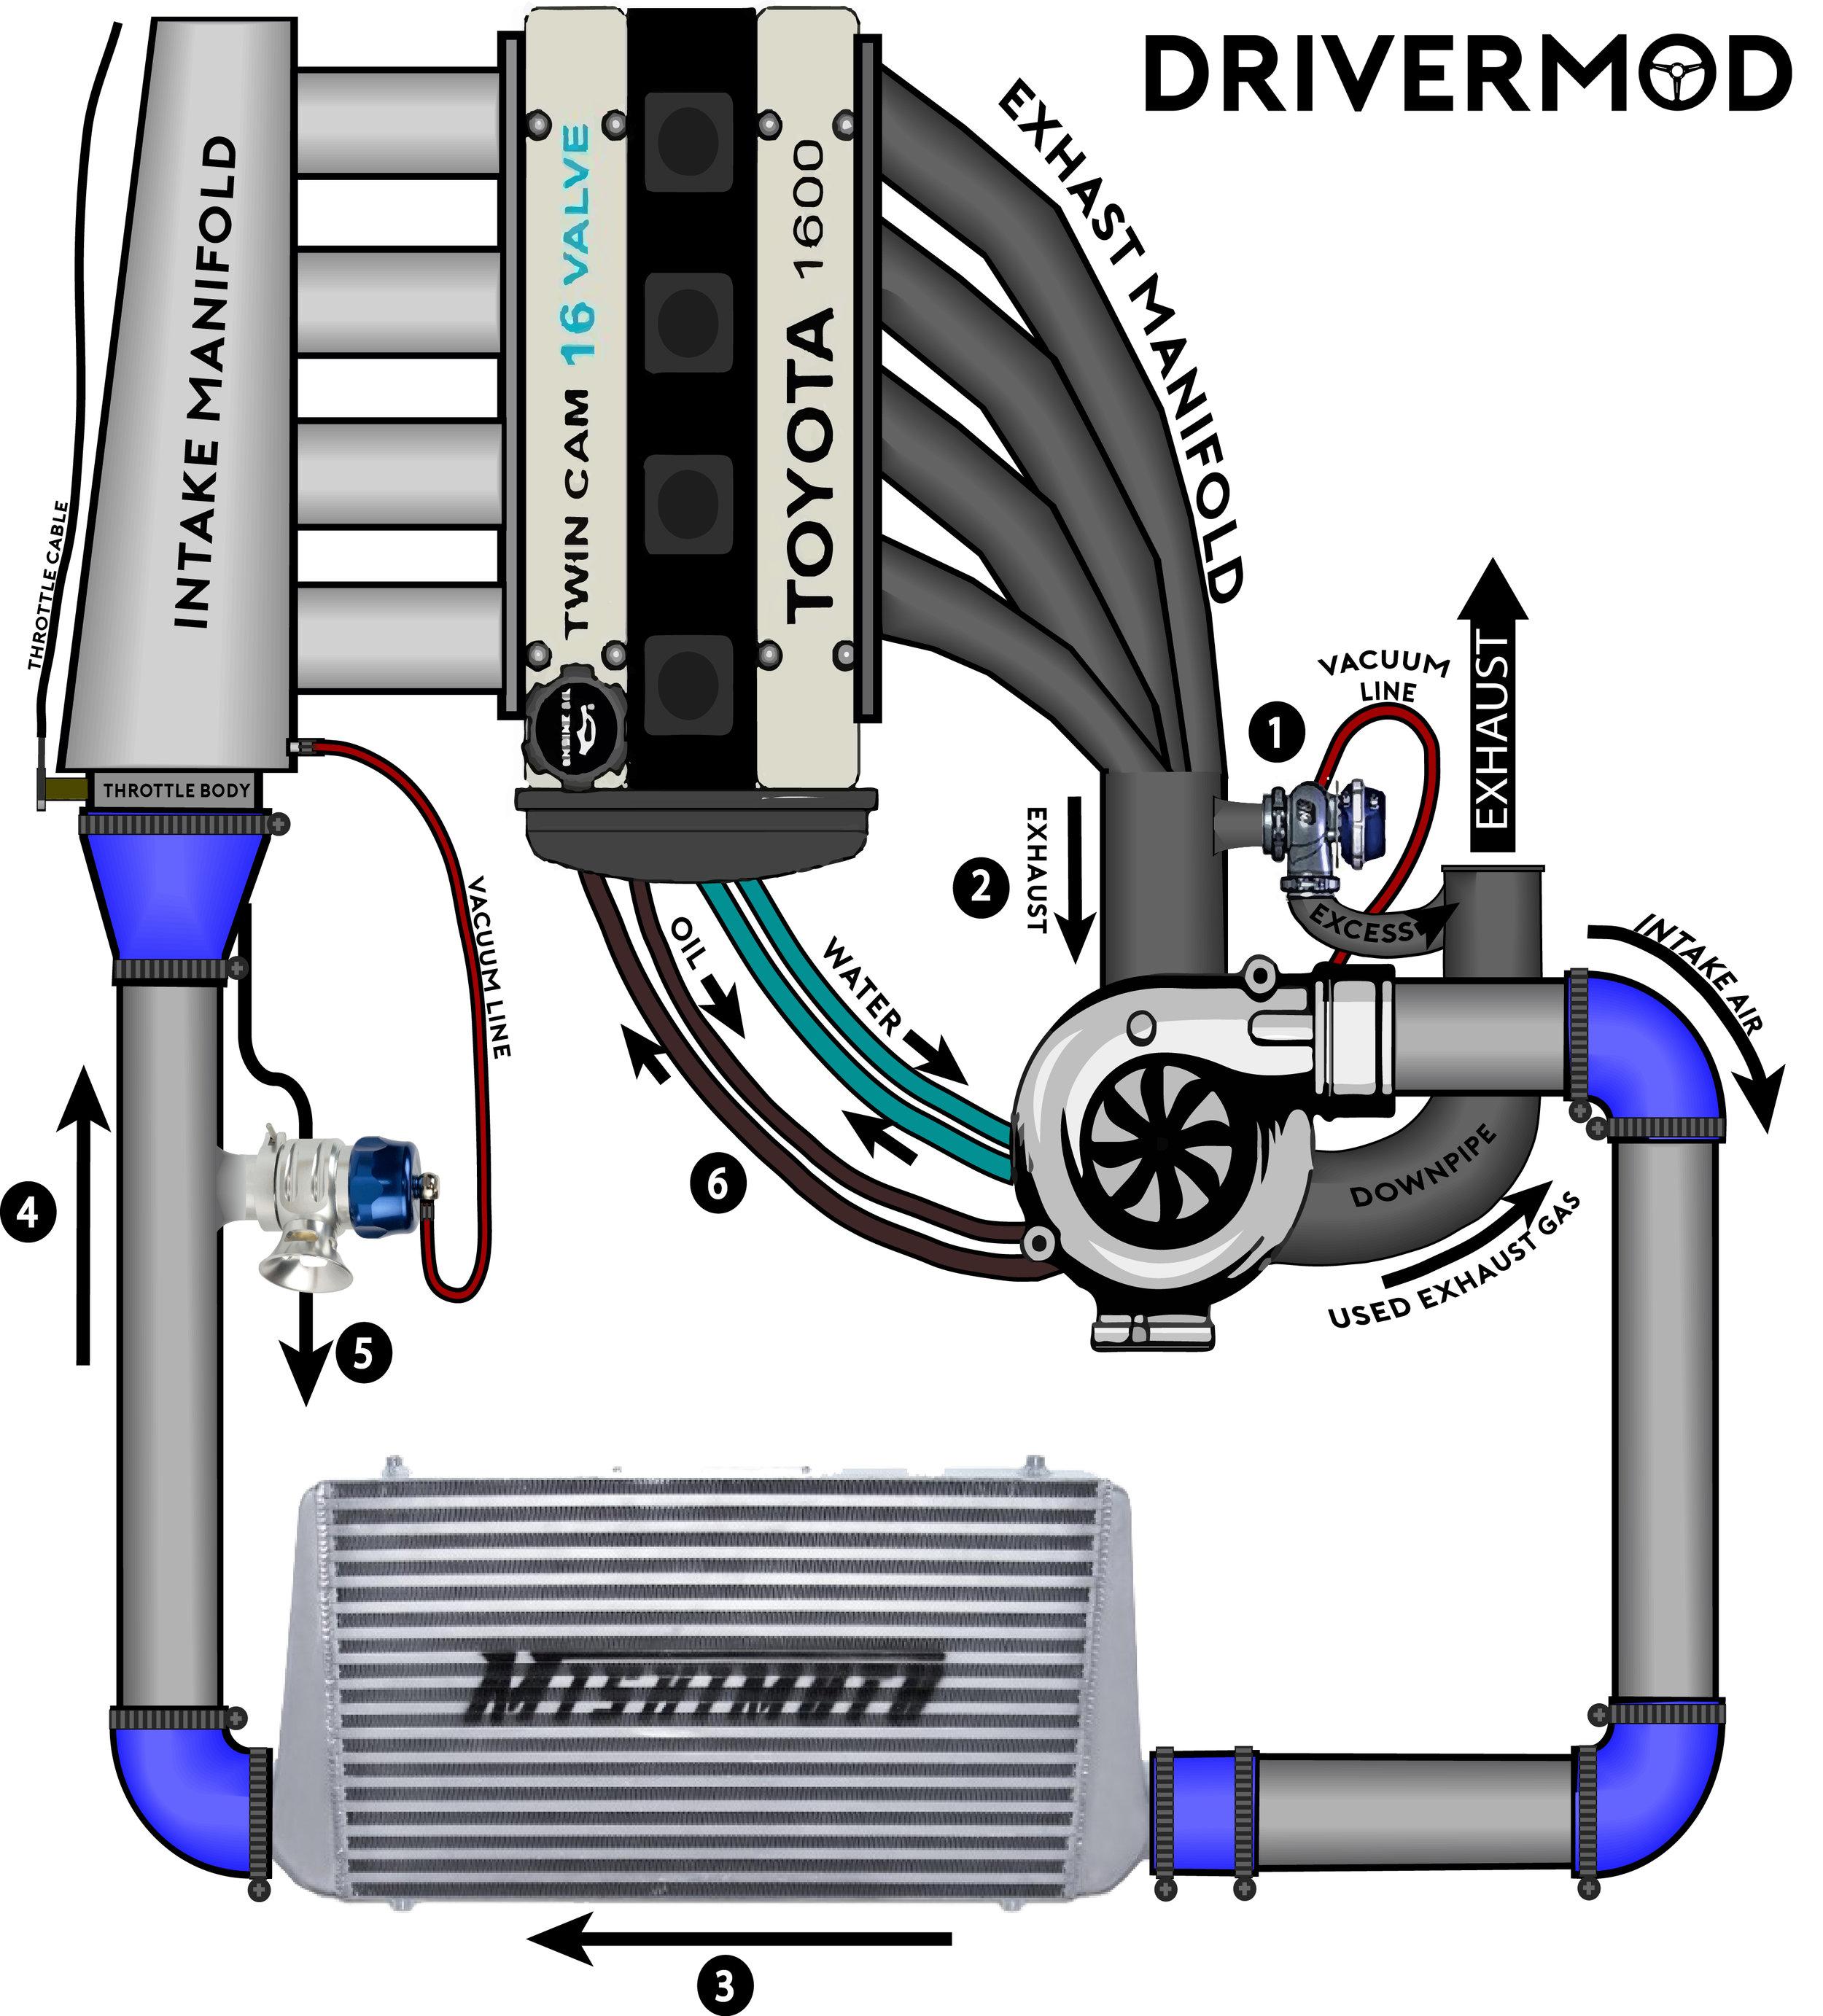 plumbing manifold diagram of 3 way switch wiring turbocharging for dummies  drivermod